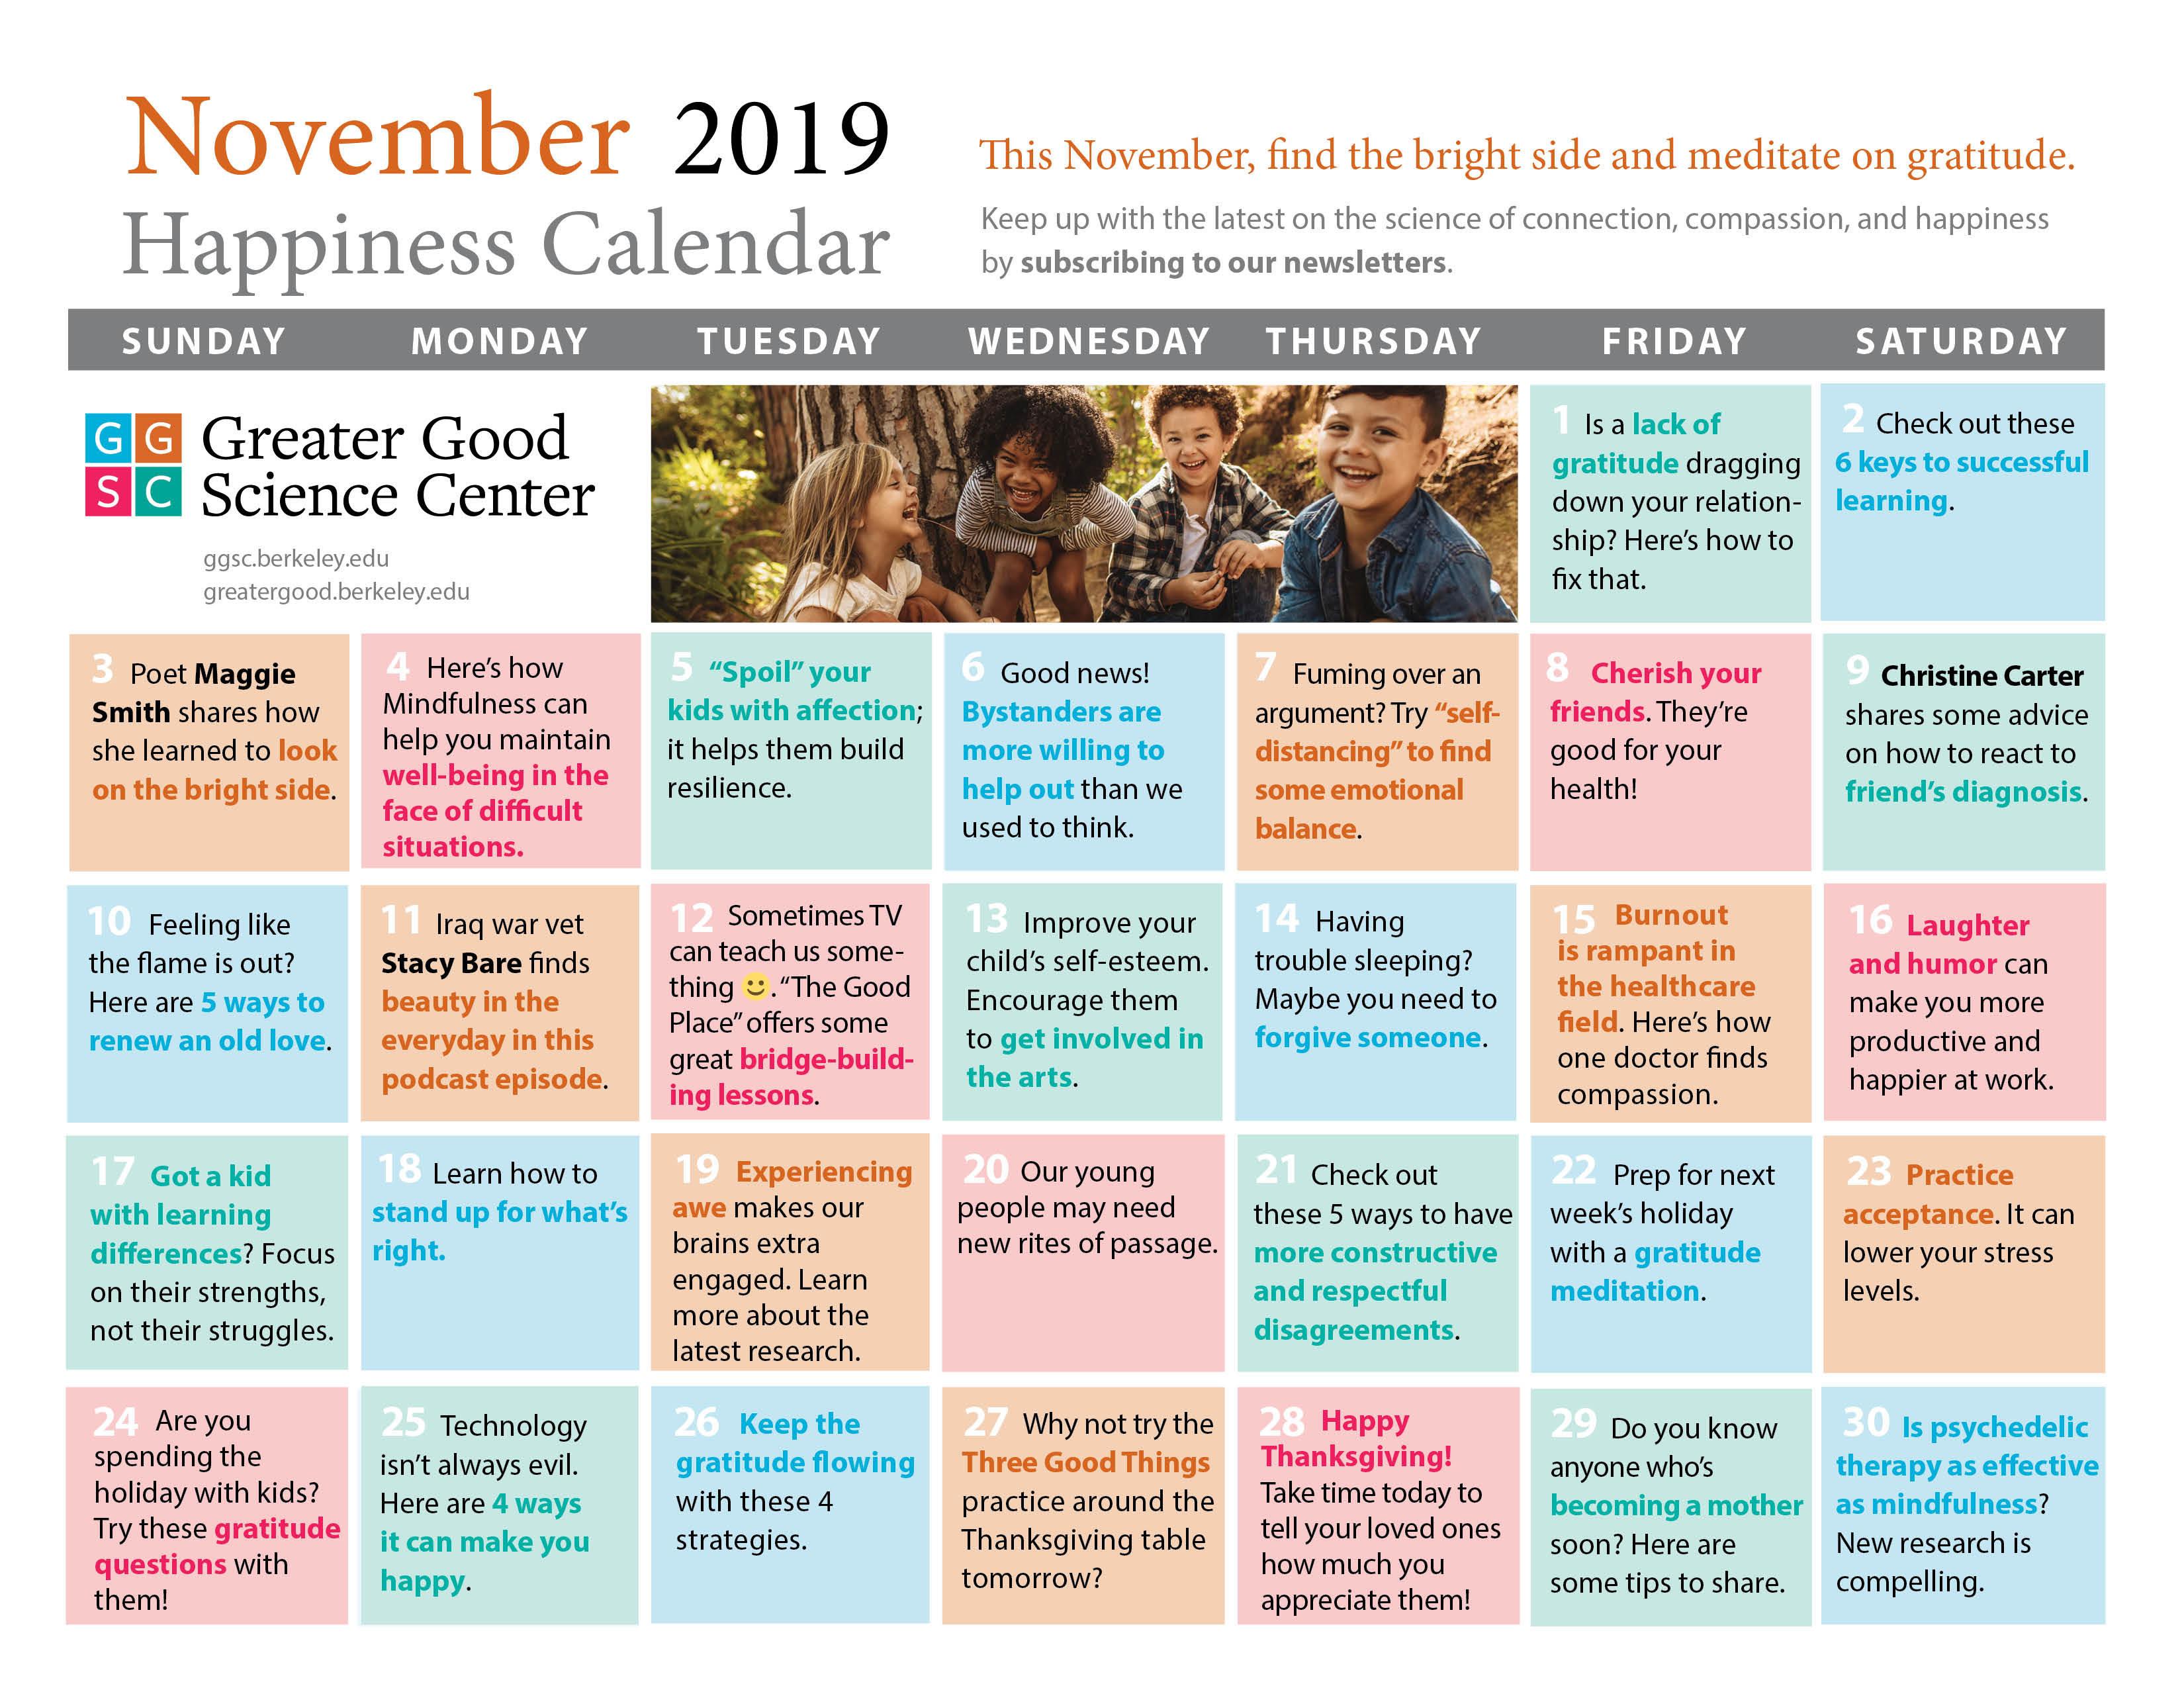 Your Happiness Calendar For November 2019 pertaining to Uc Berkeley 2020 Calendar